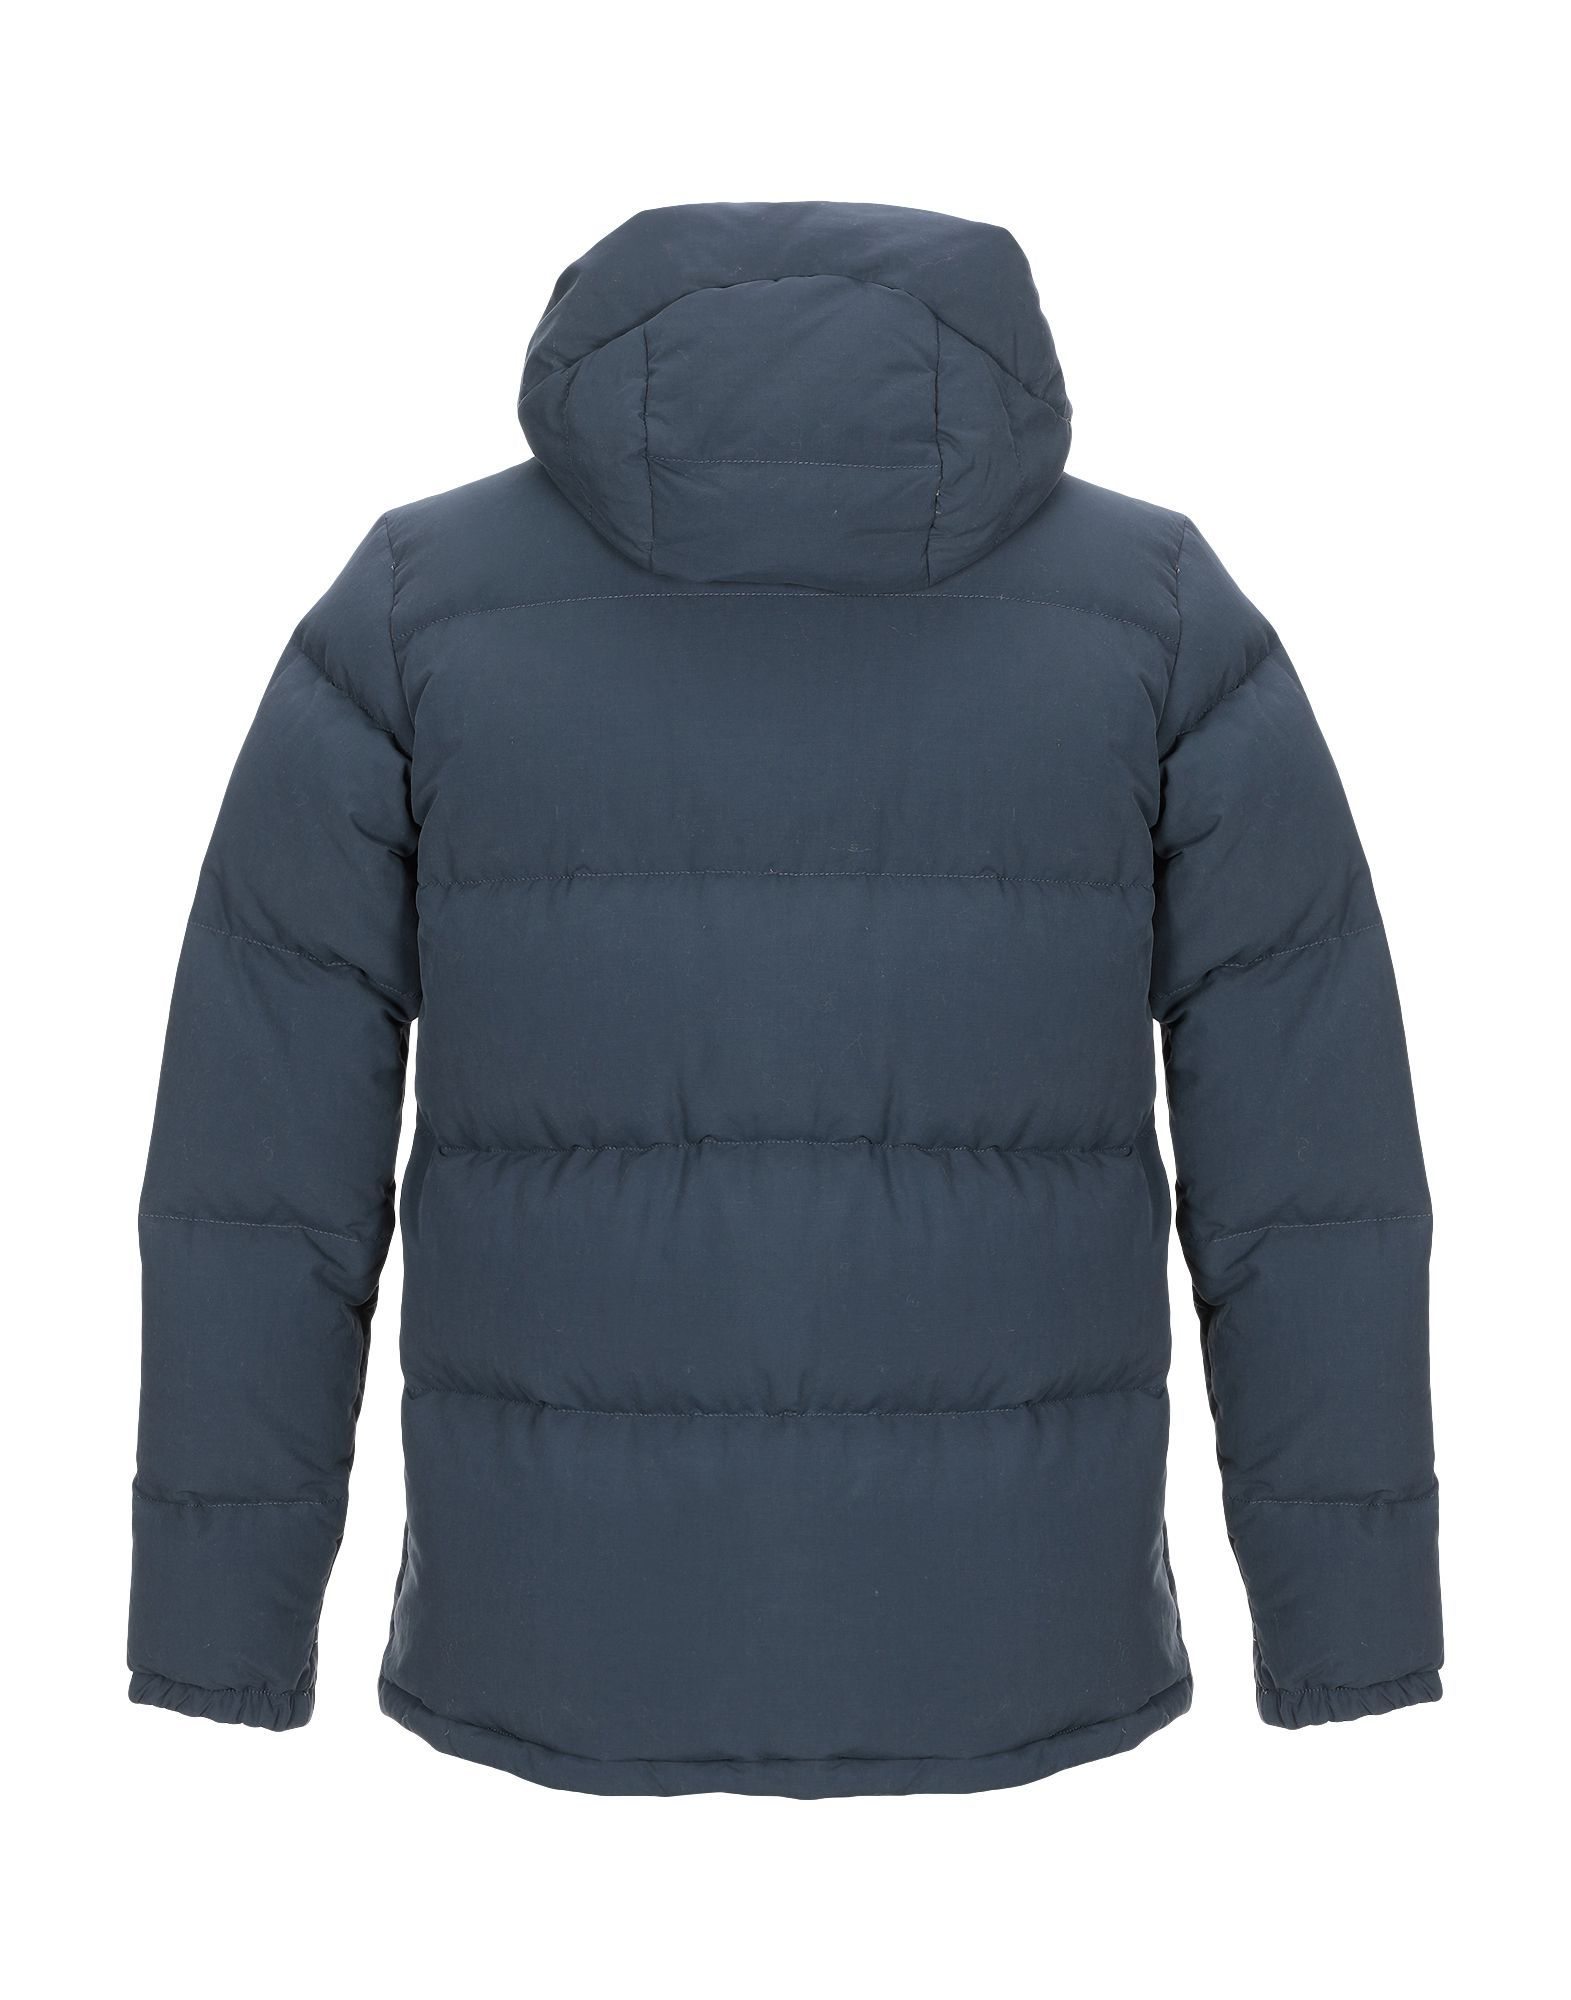 The North Face Dark Blue Jacket